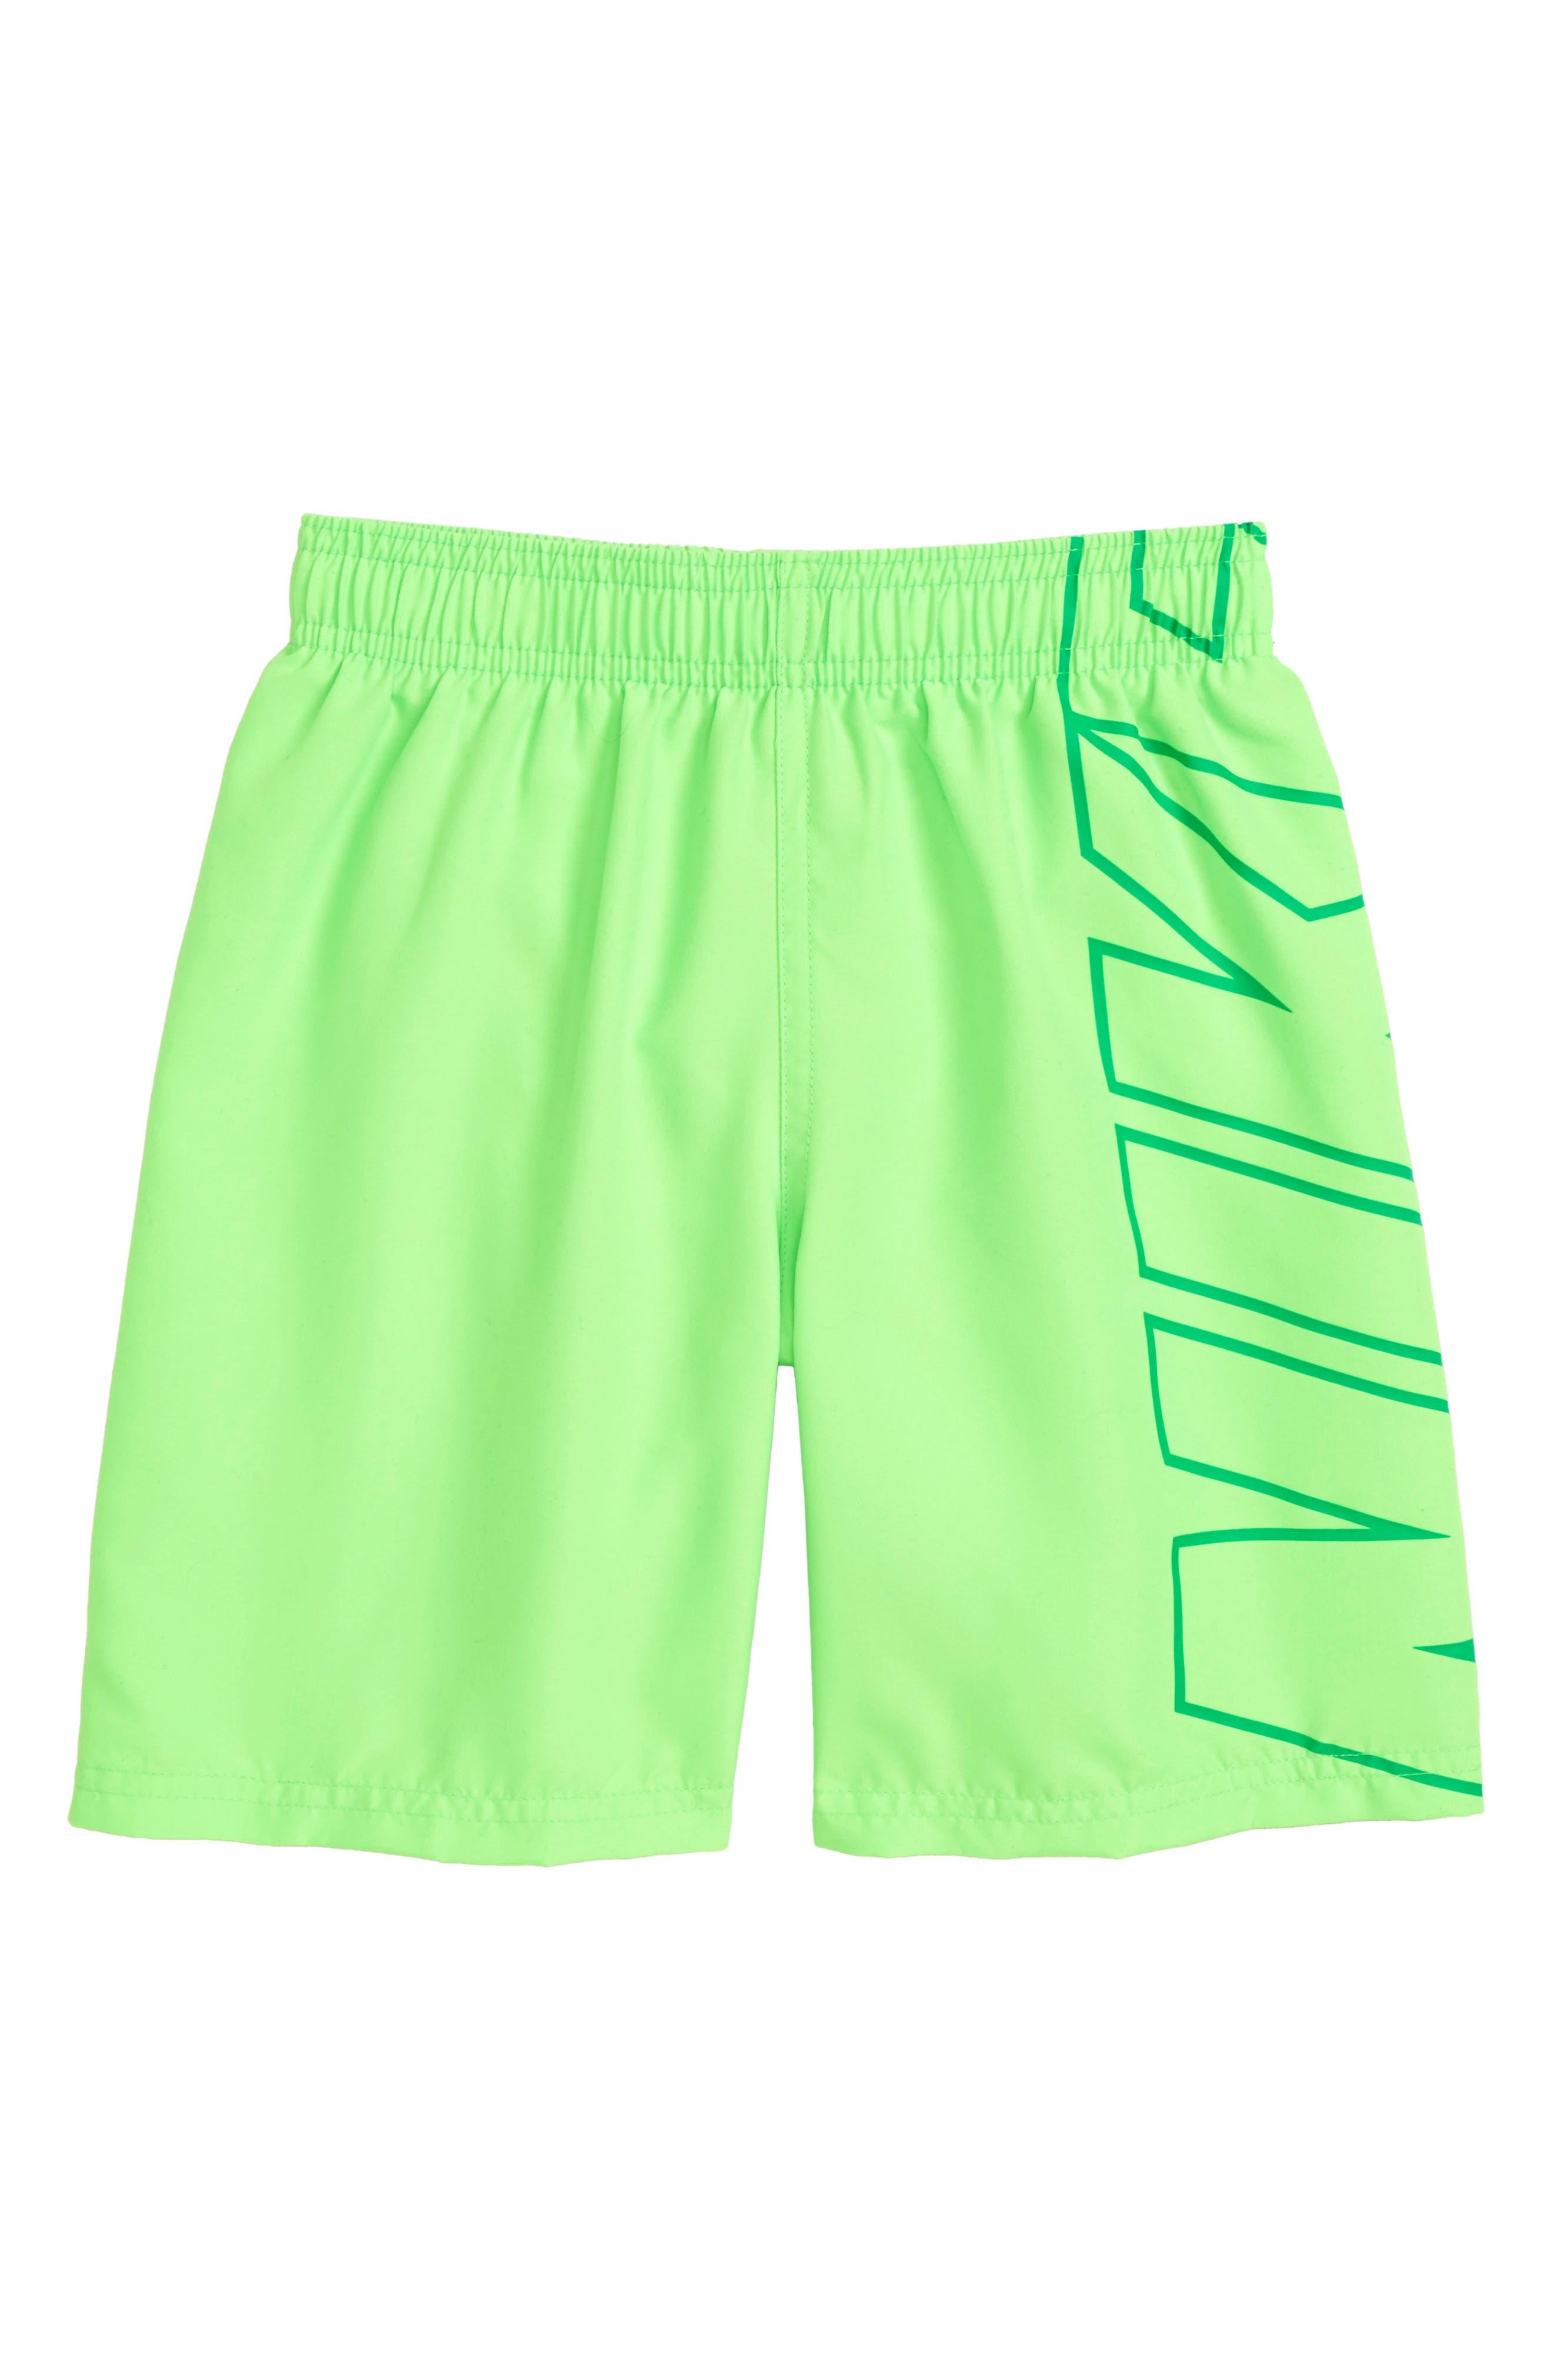 Breaker Board Shorts,                         Main,                         color, Green Strike